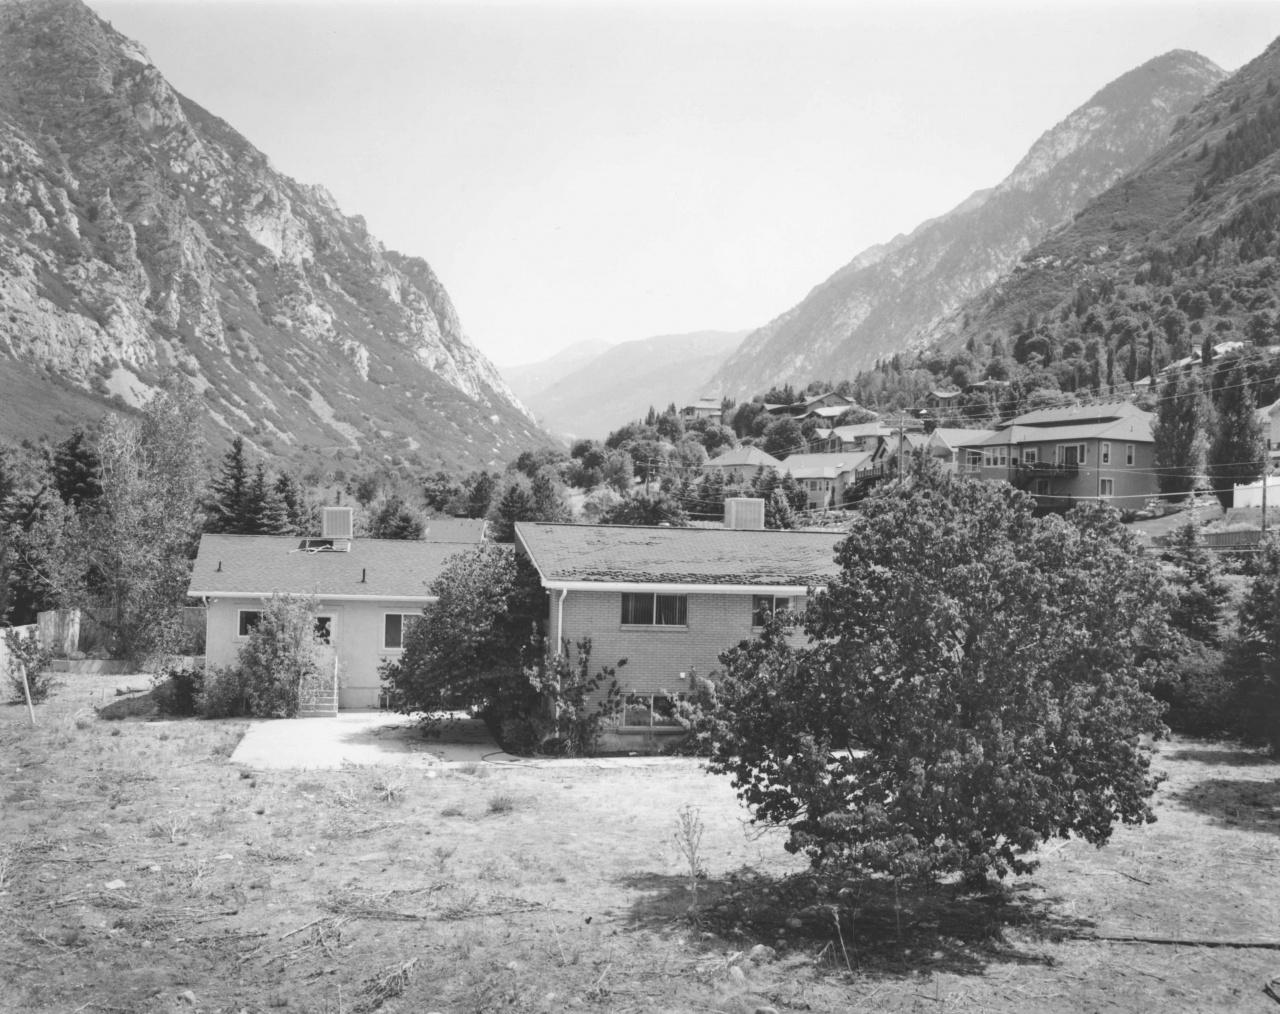 FLDS Compound, Little Cottonwood Canyon, Utah